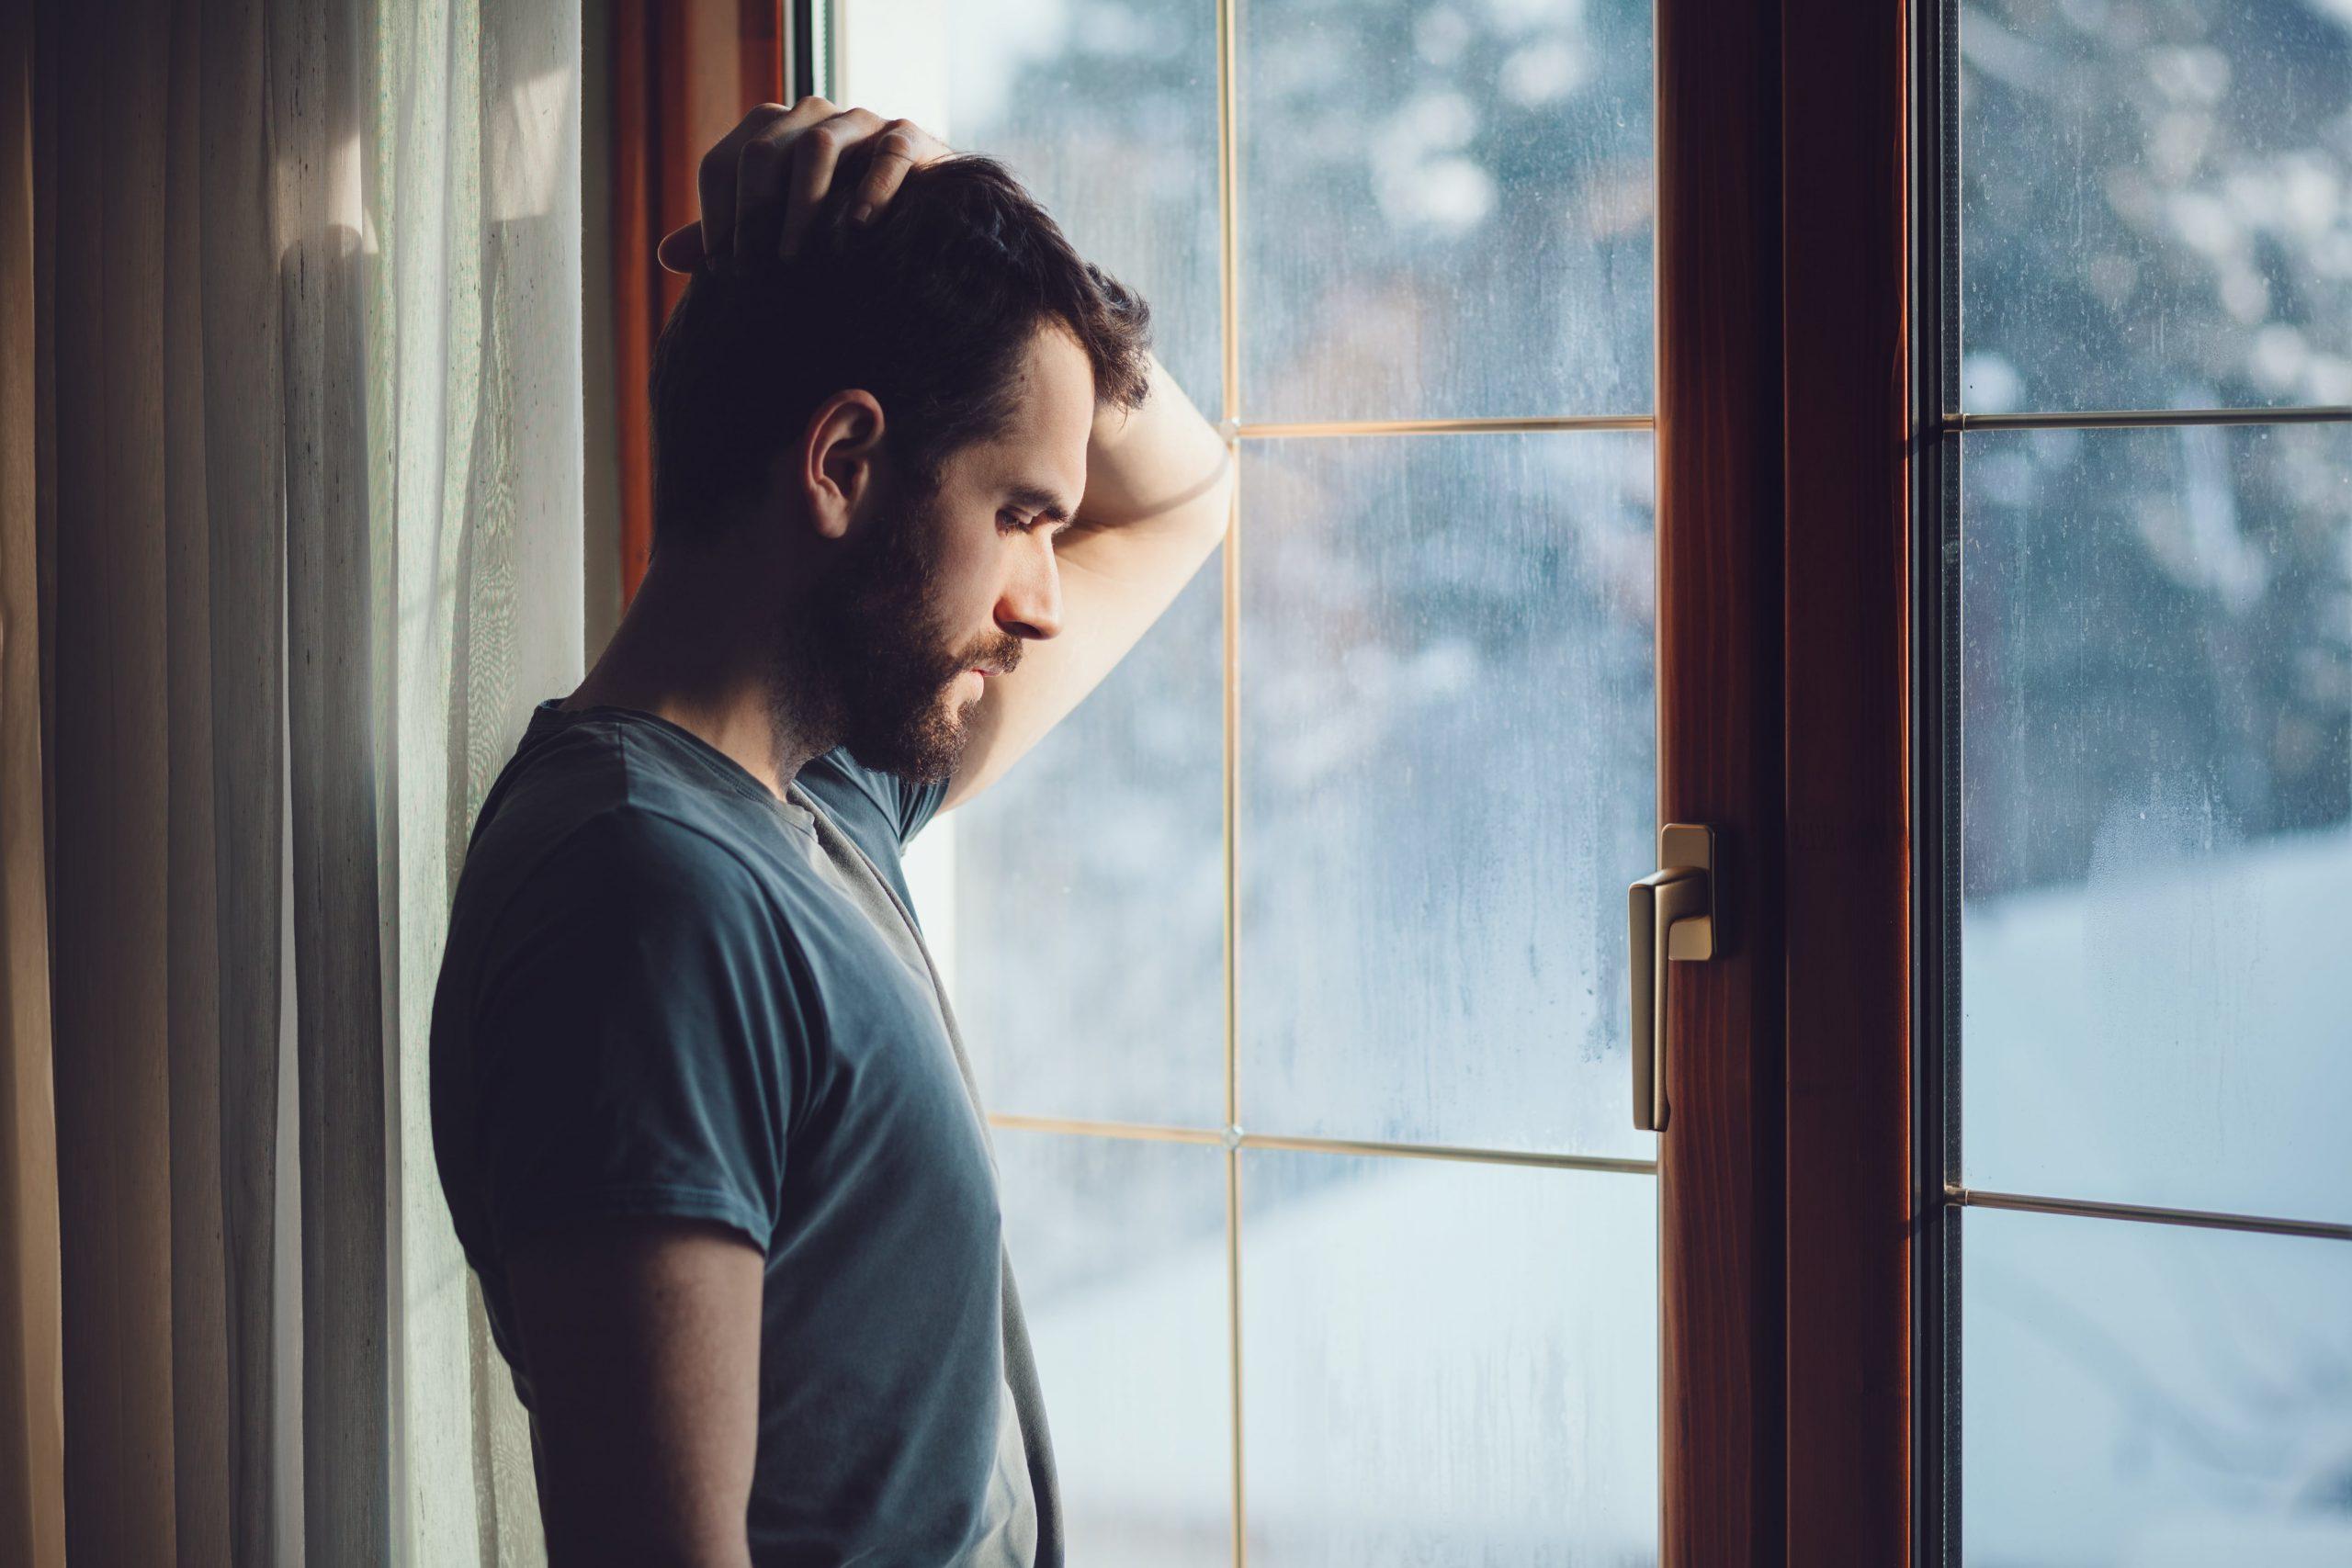 Shadowed man looking out window, hand on head, regretful